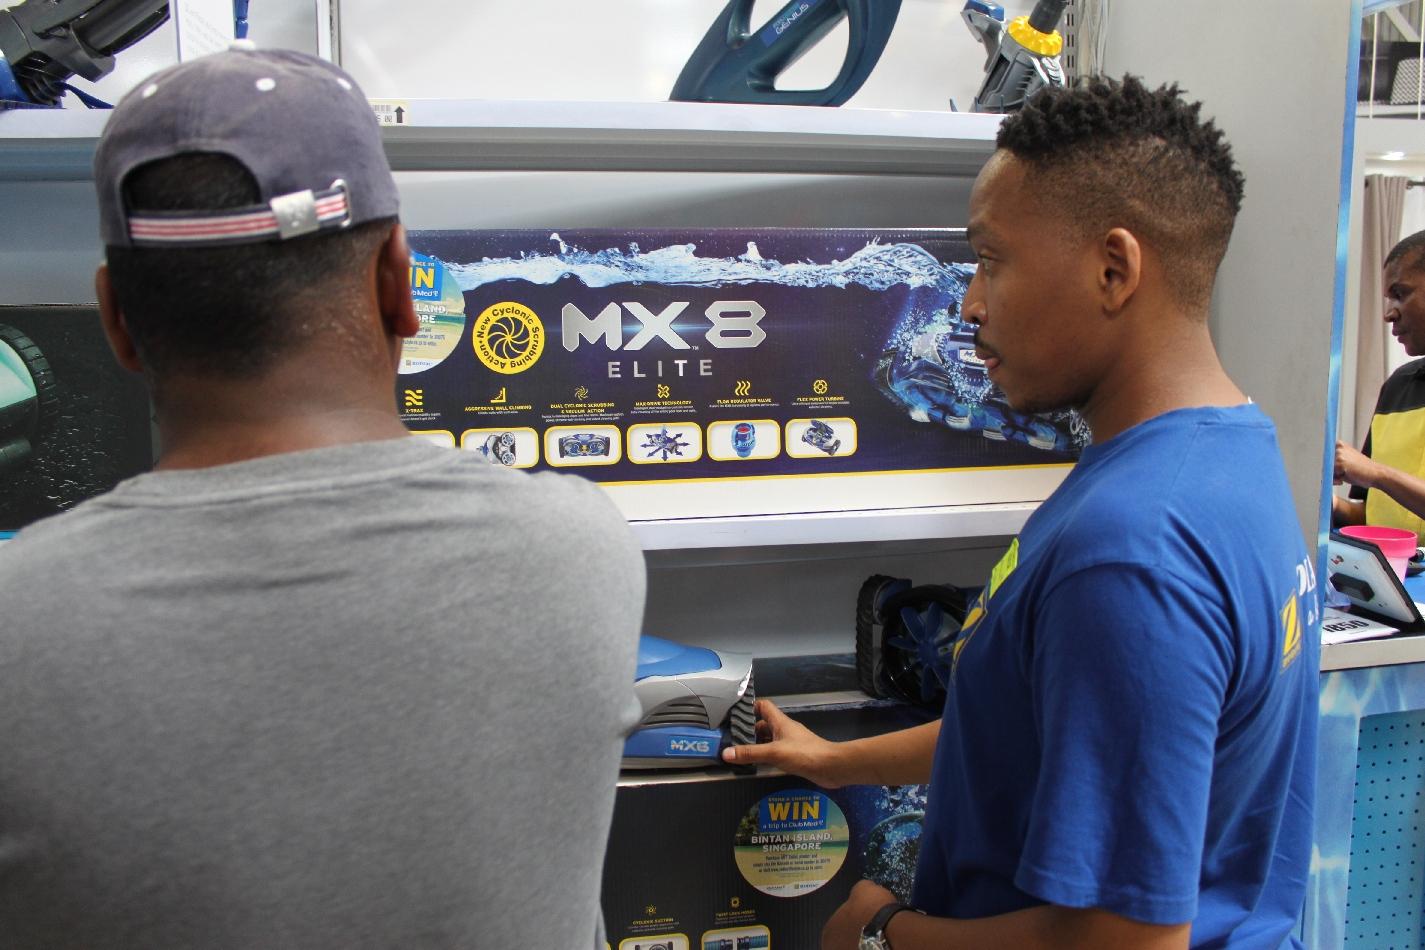 ProActive™ launches MX8 Elite for Zodiac